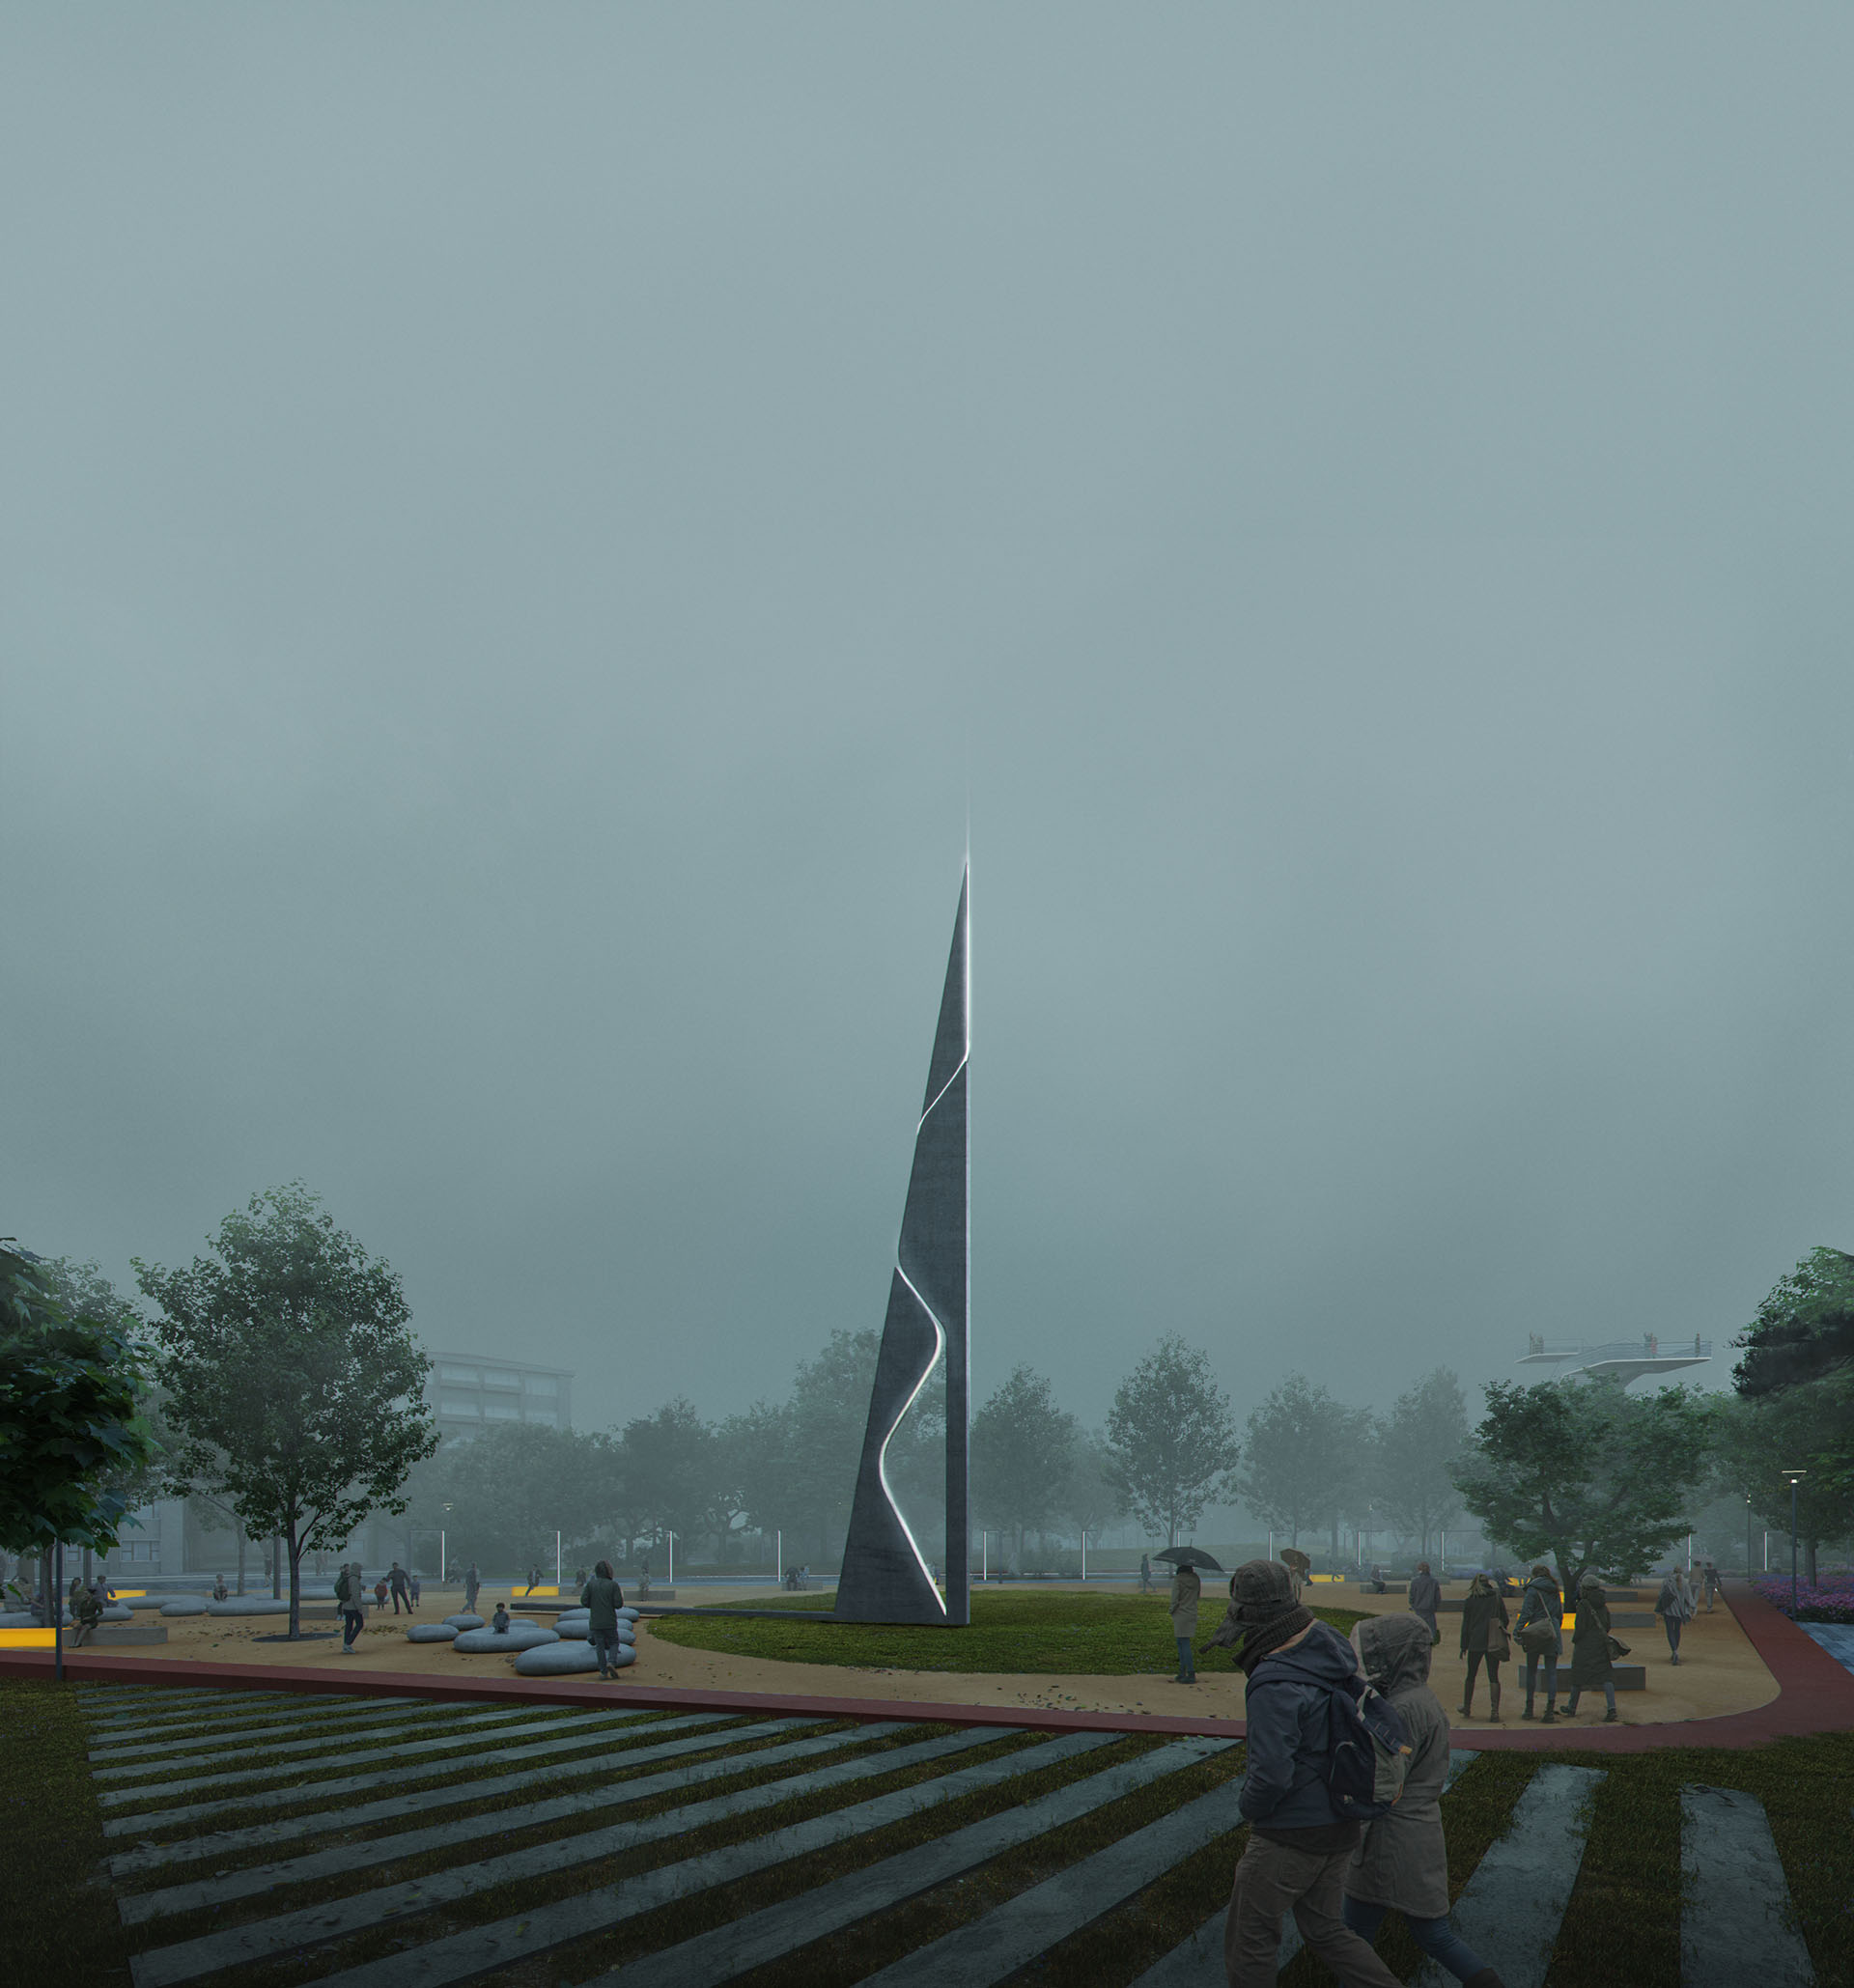 Duzce City Park